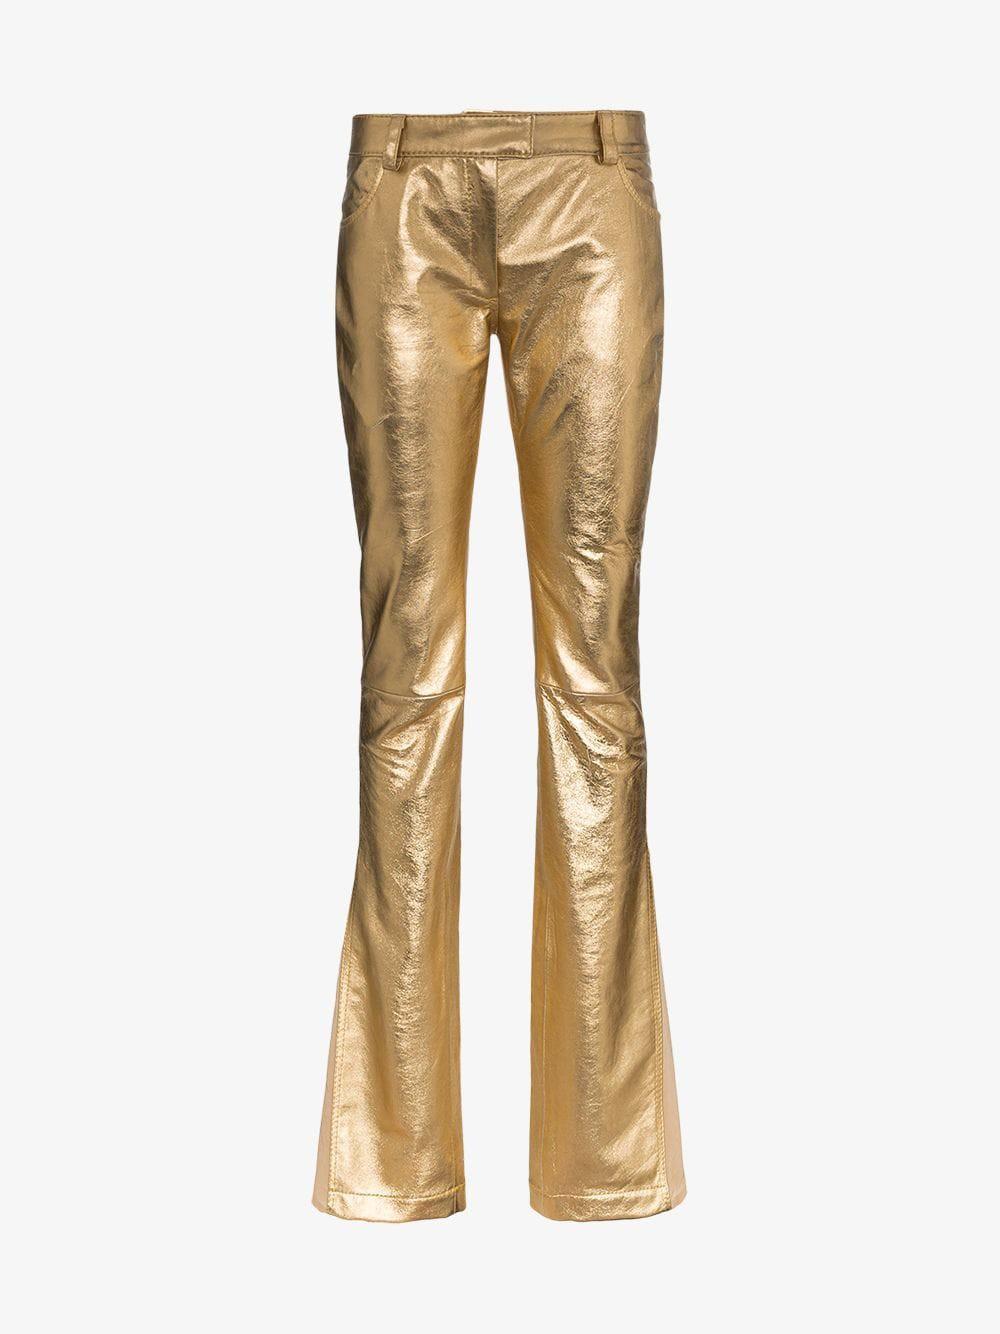 60cd196ca29 Ronald Van Der Kemp Slim Flared Leg Leather Trousers in gold